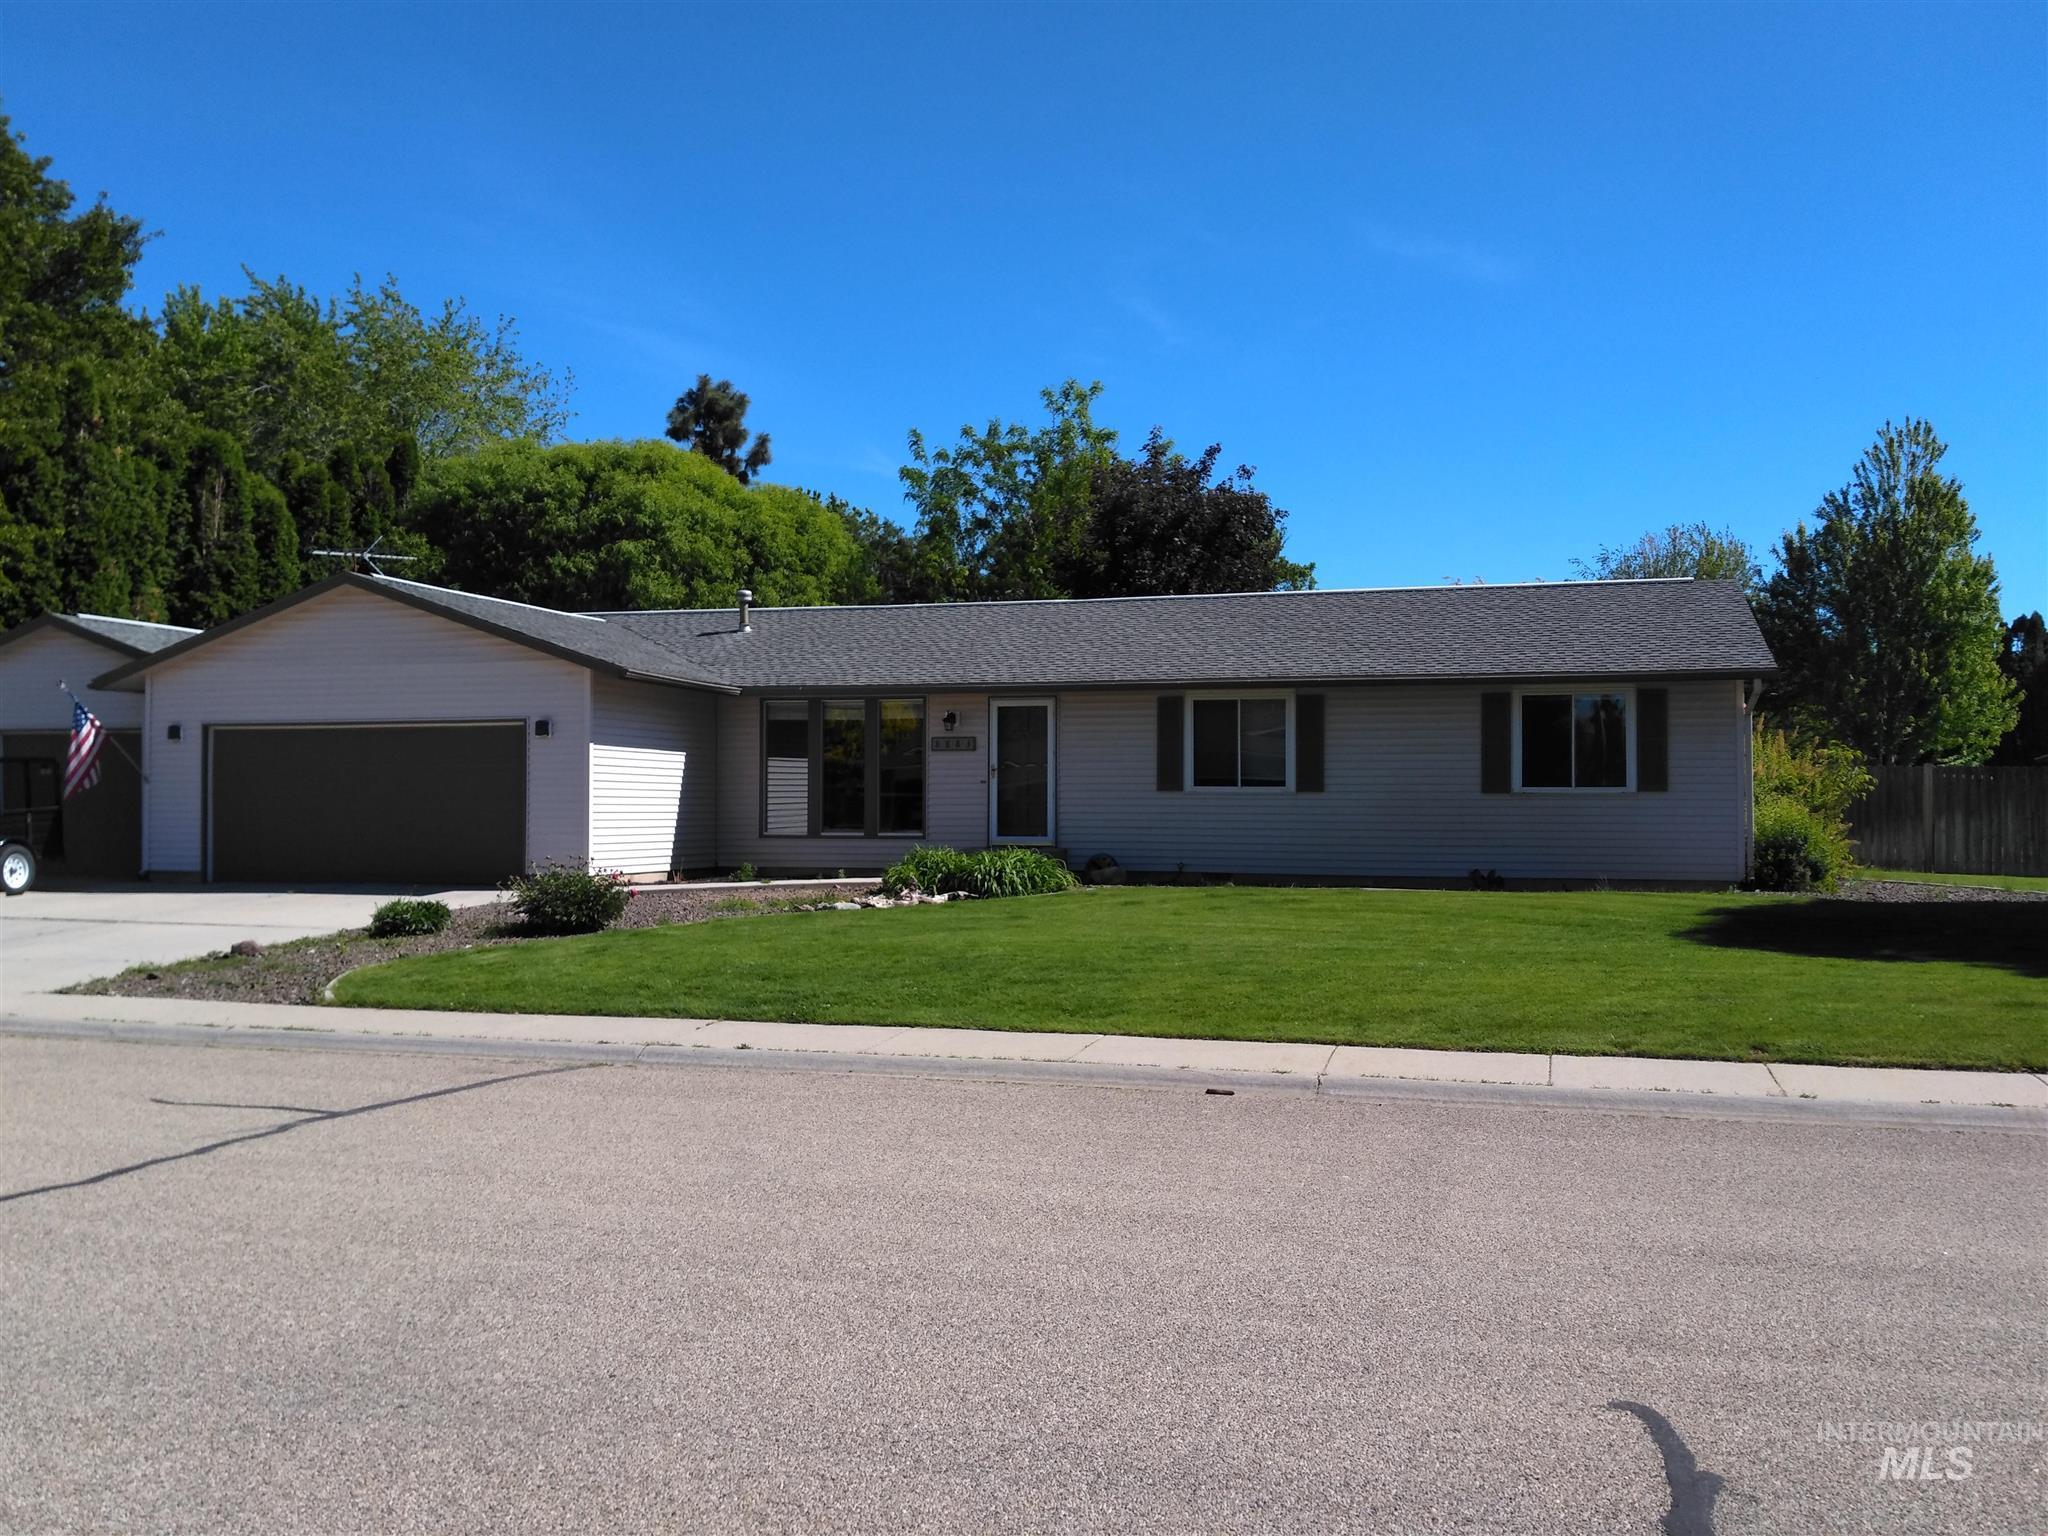 8883 W Wichita Property Photo - Boise, ID real estate listing